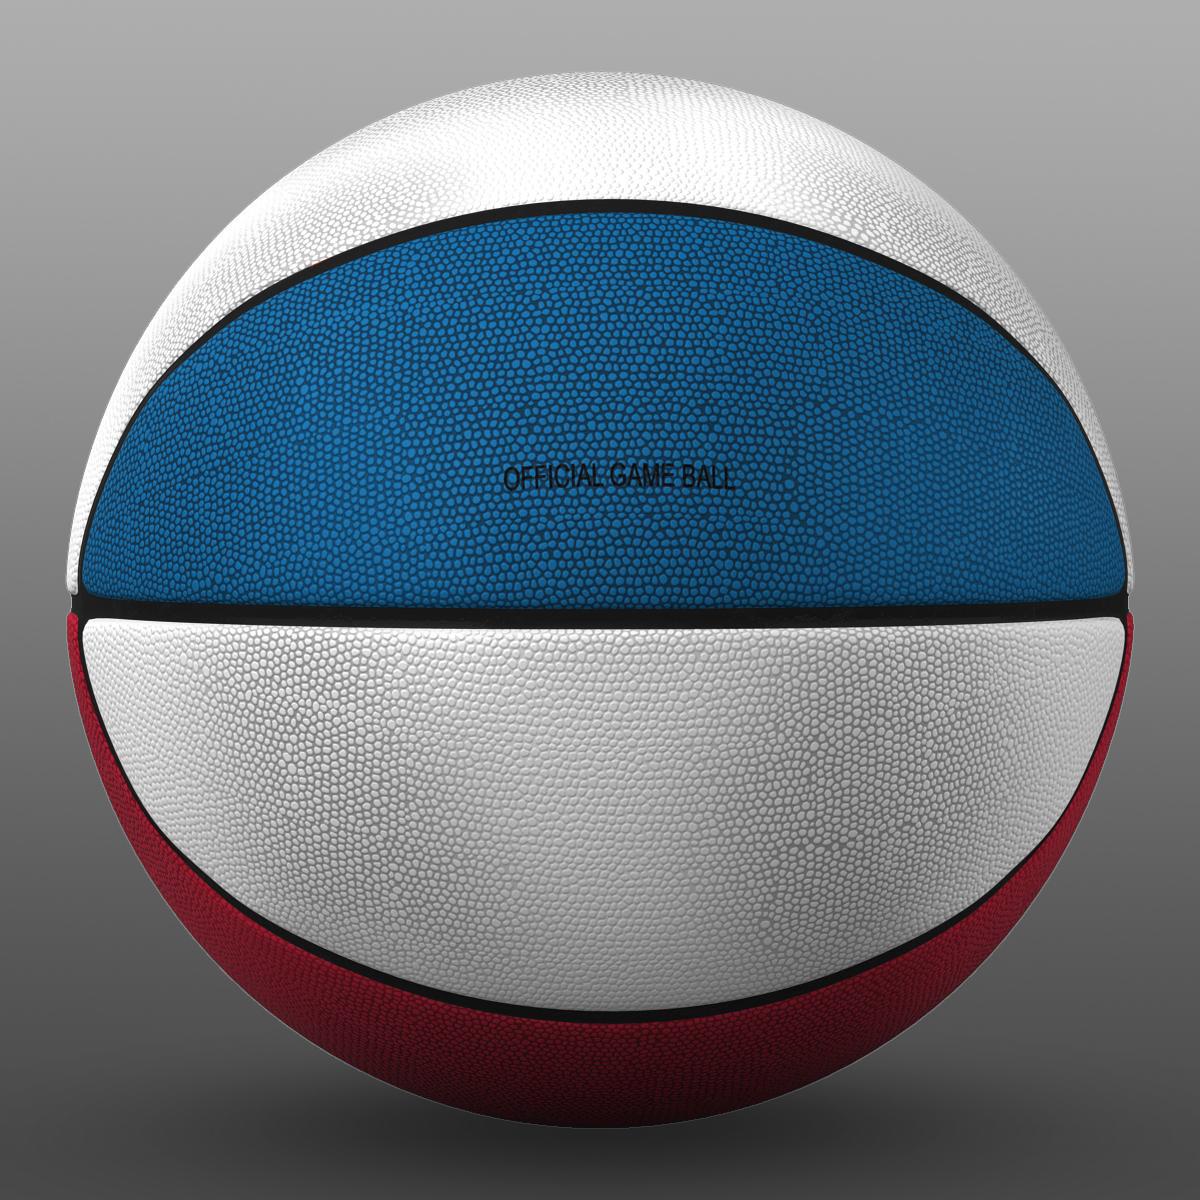 tricolor basketball ball 3d model 3ds max fbx c4d ma mb obj 164847